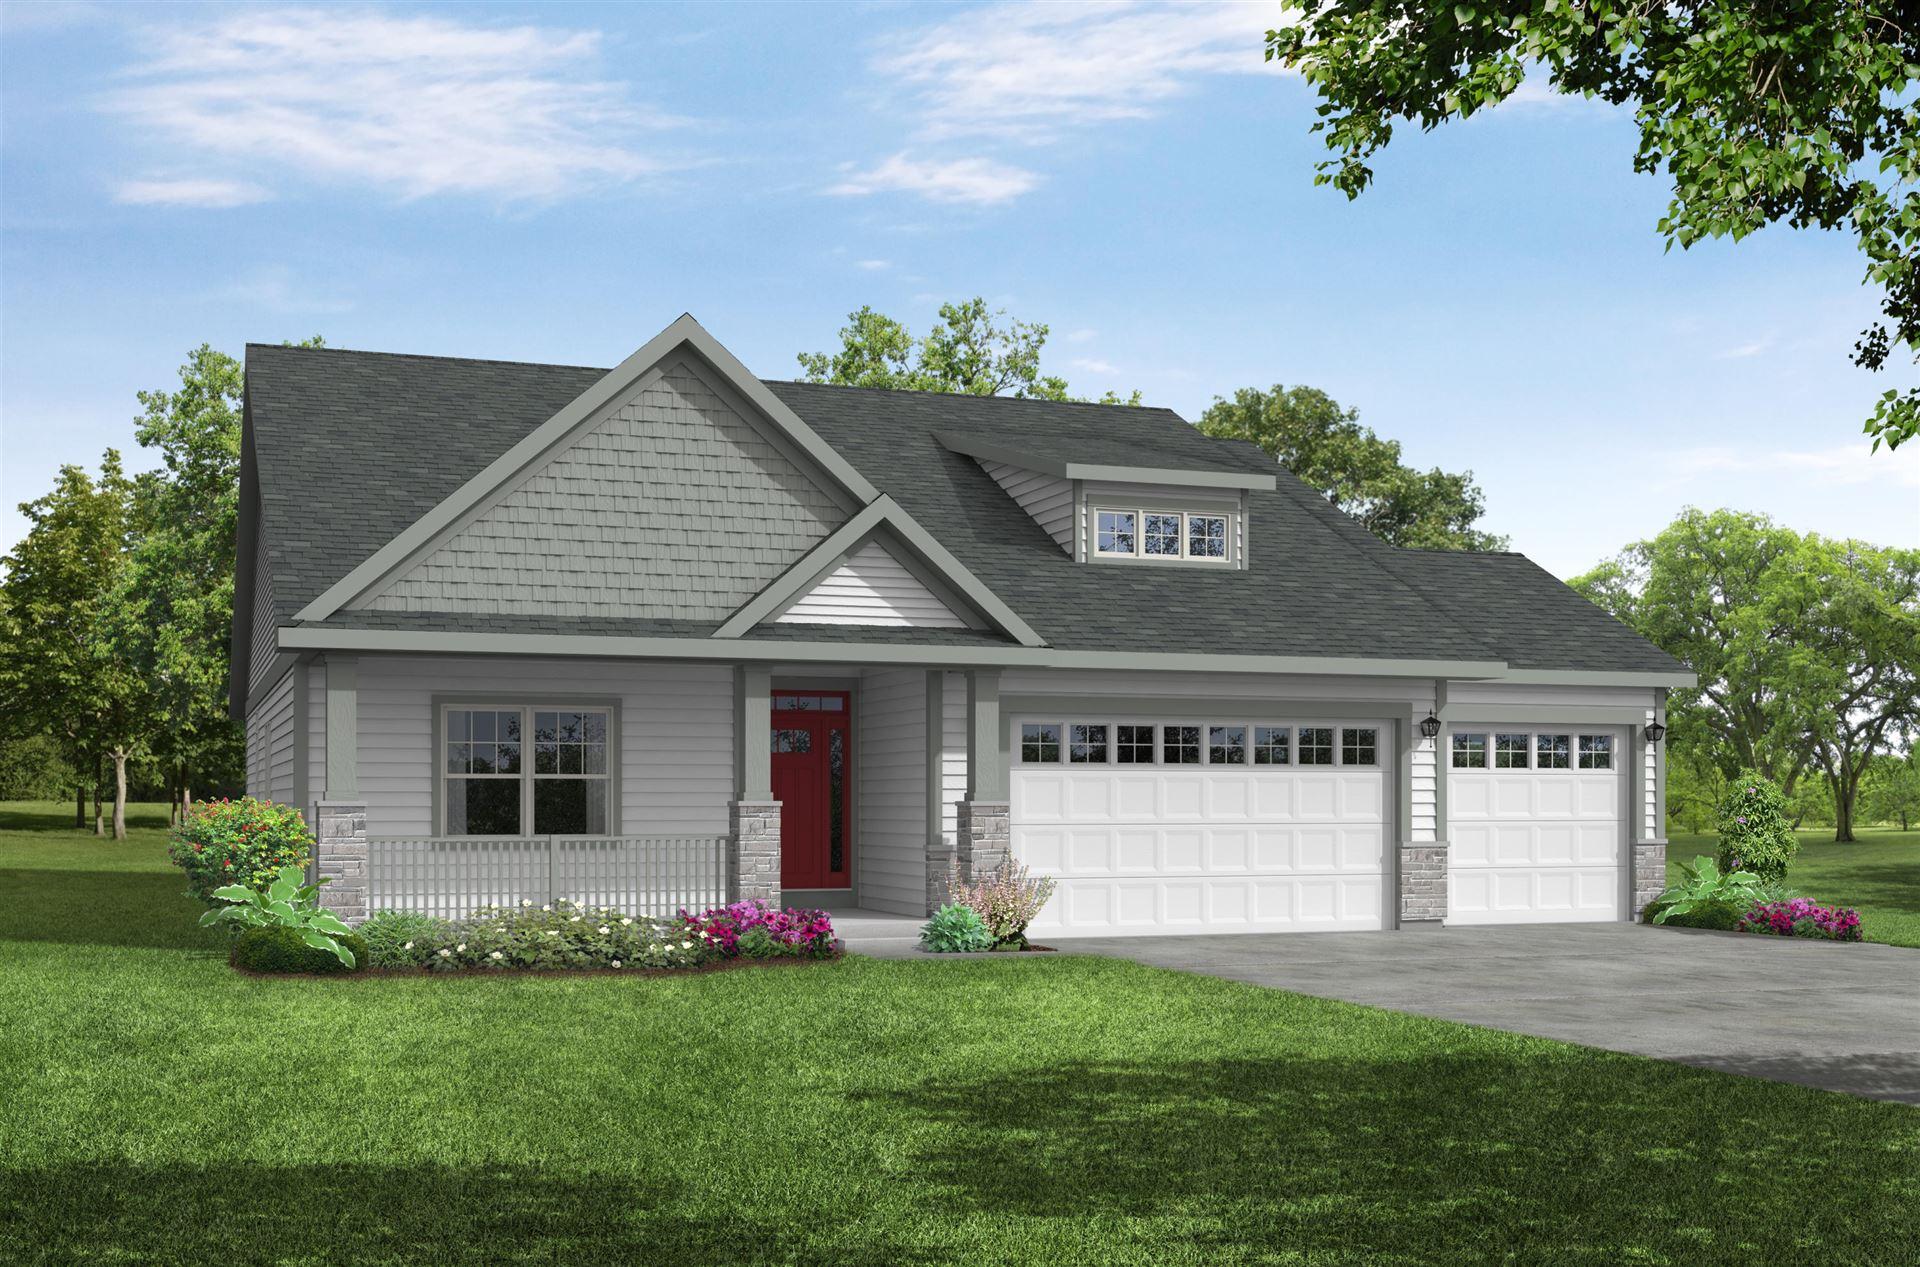 8231 Ridgeway Ct, Pleasant Prairie, WI 53158 - #: 1685733